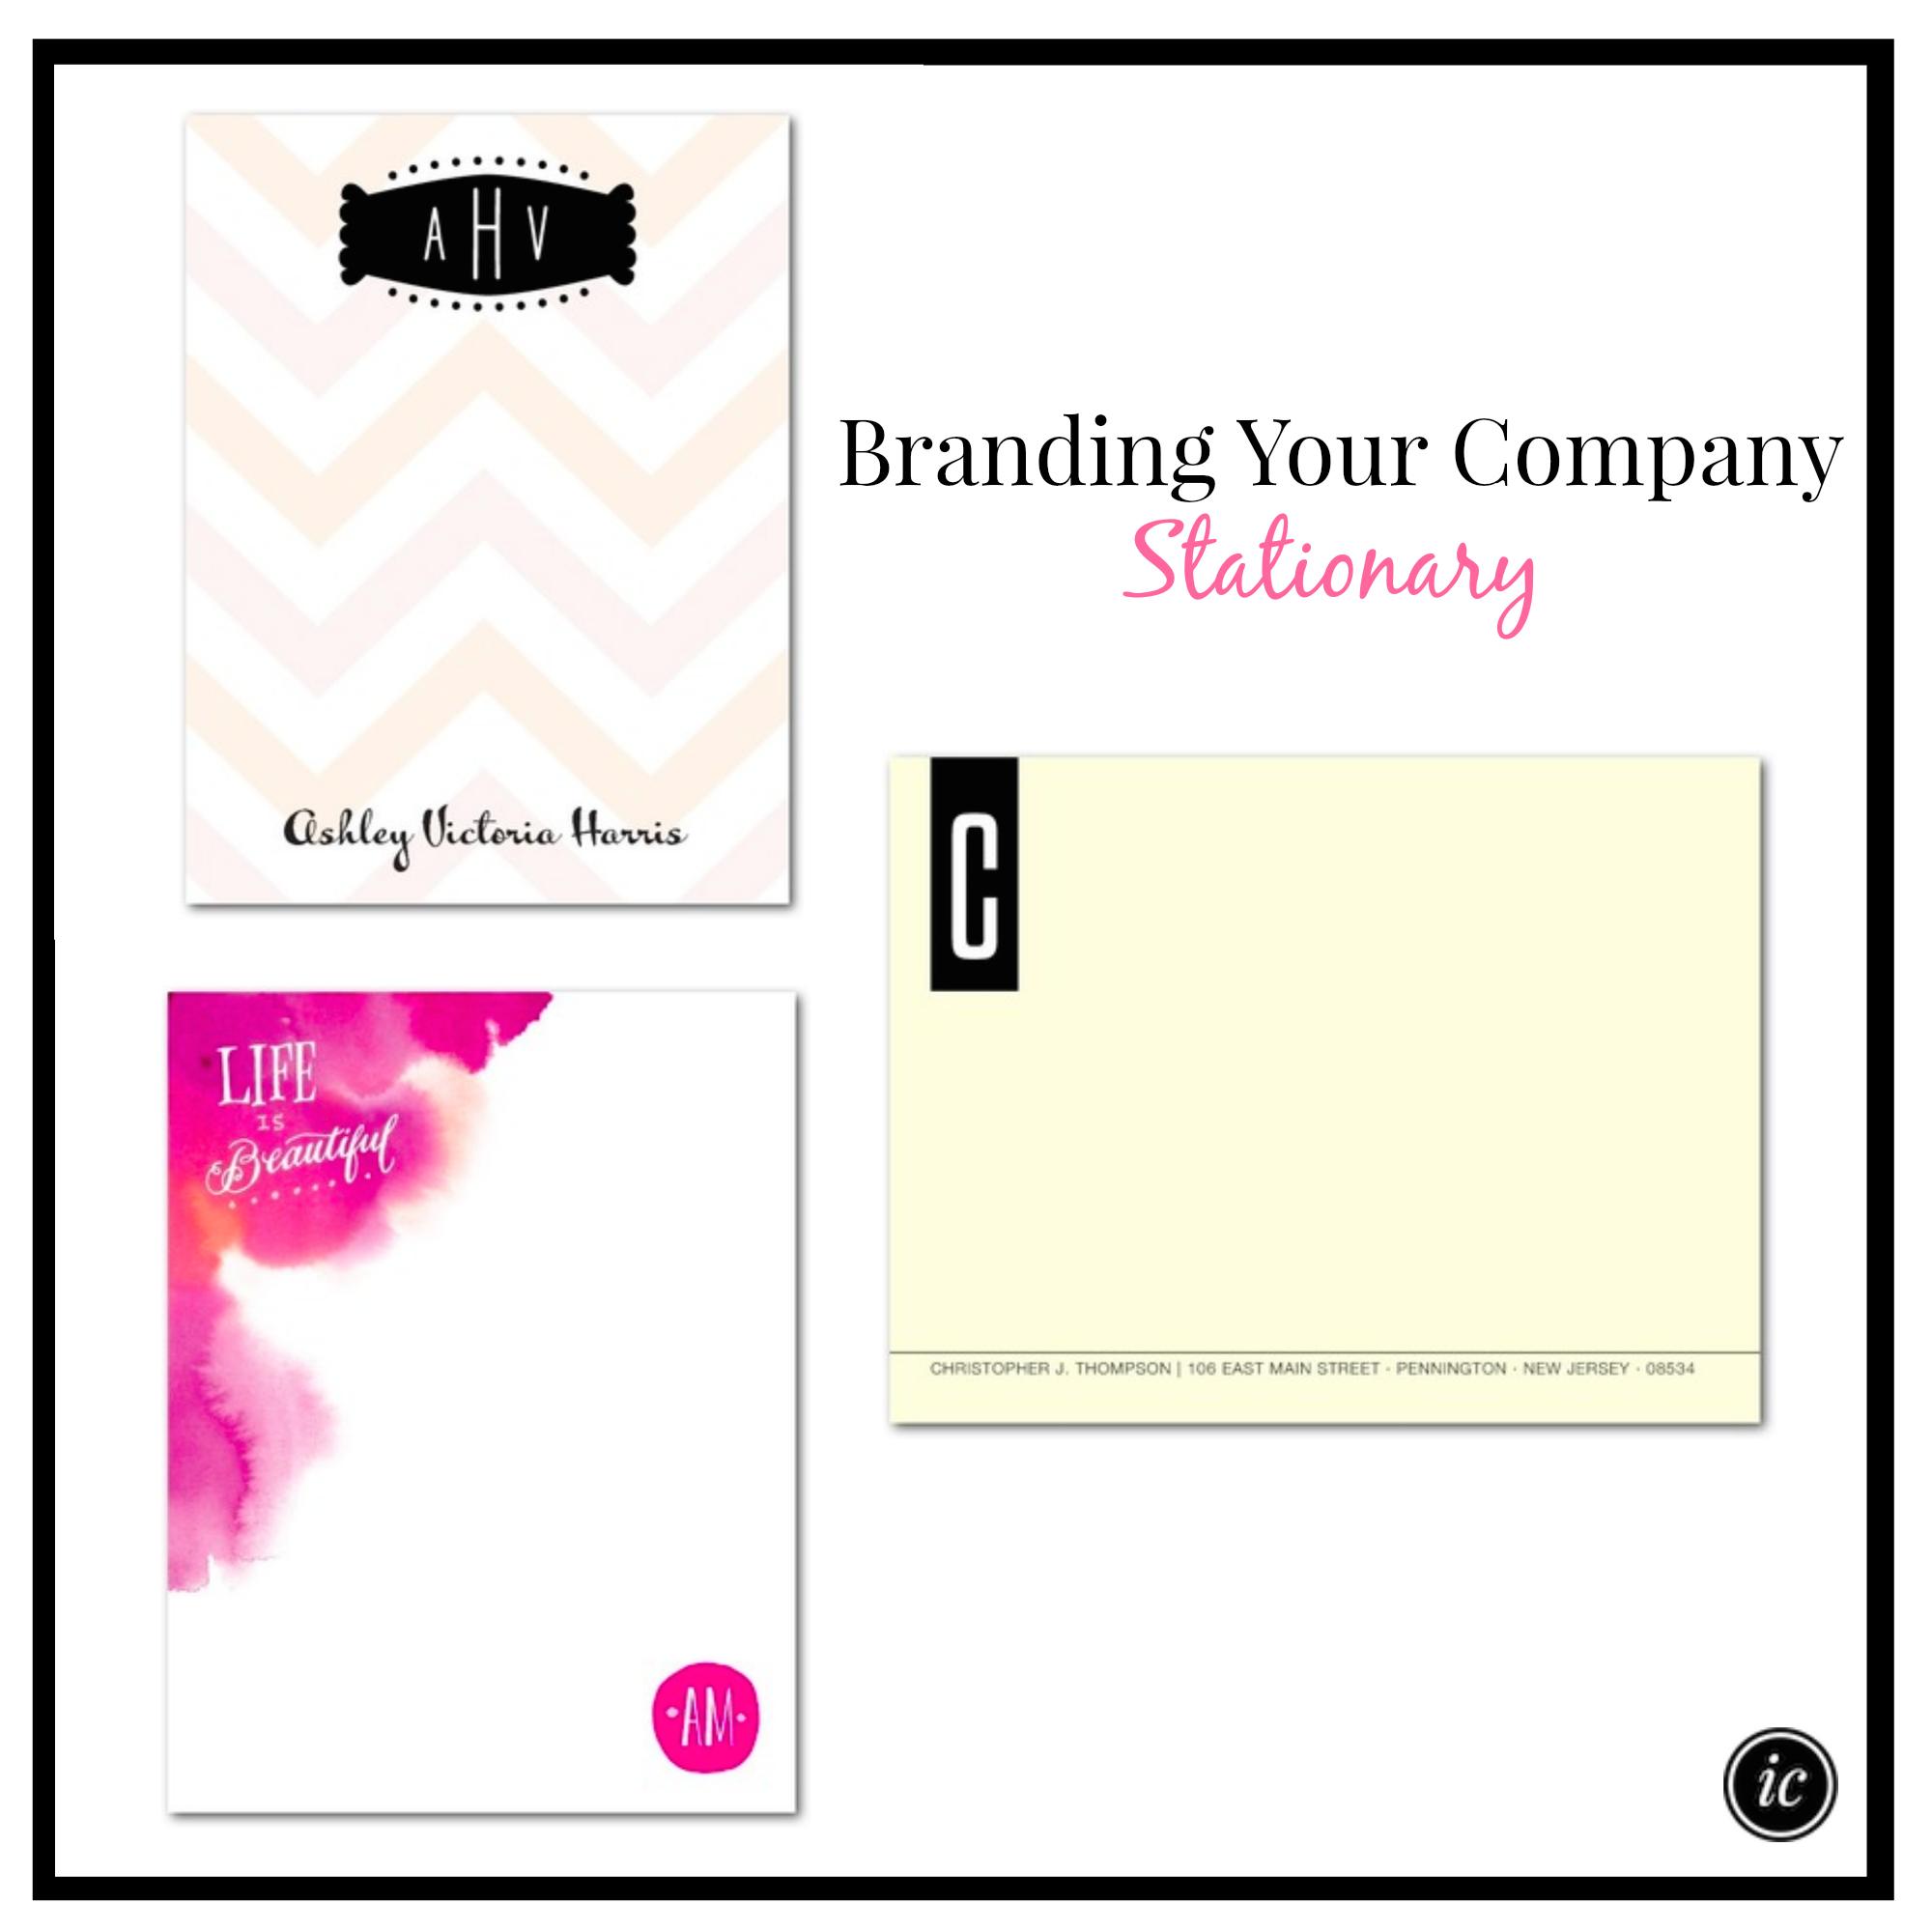 Branding Your Company Stationary